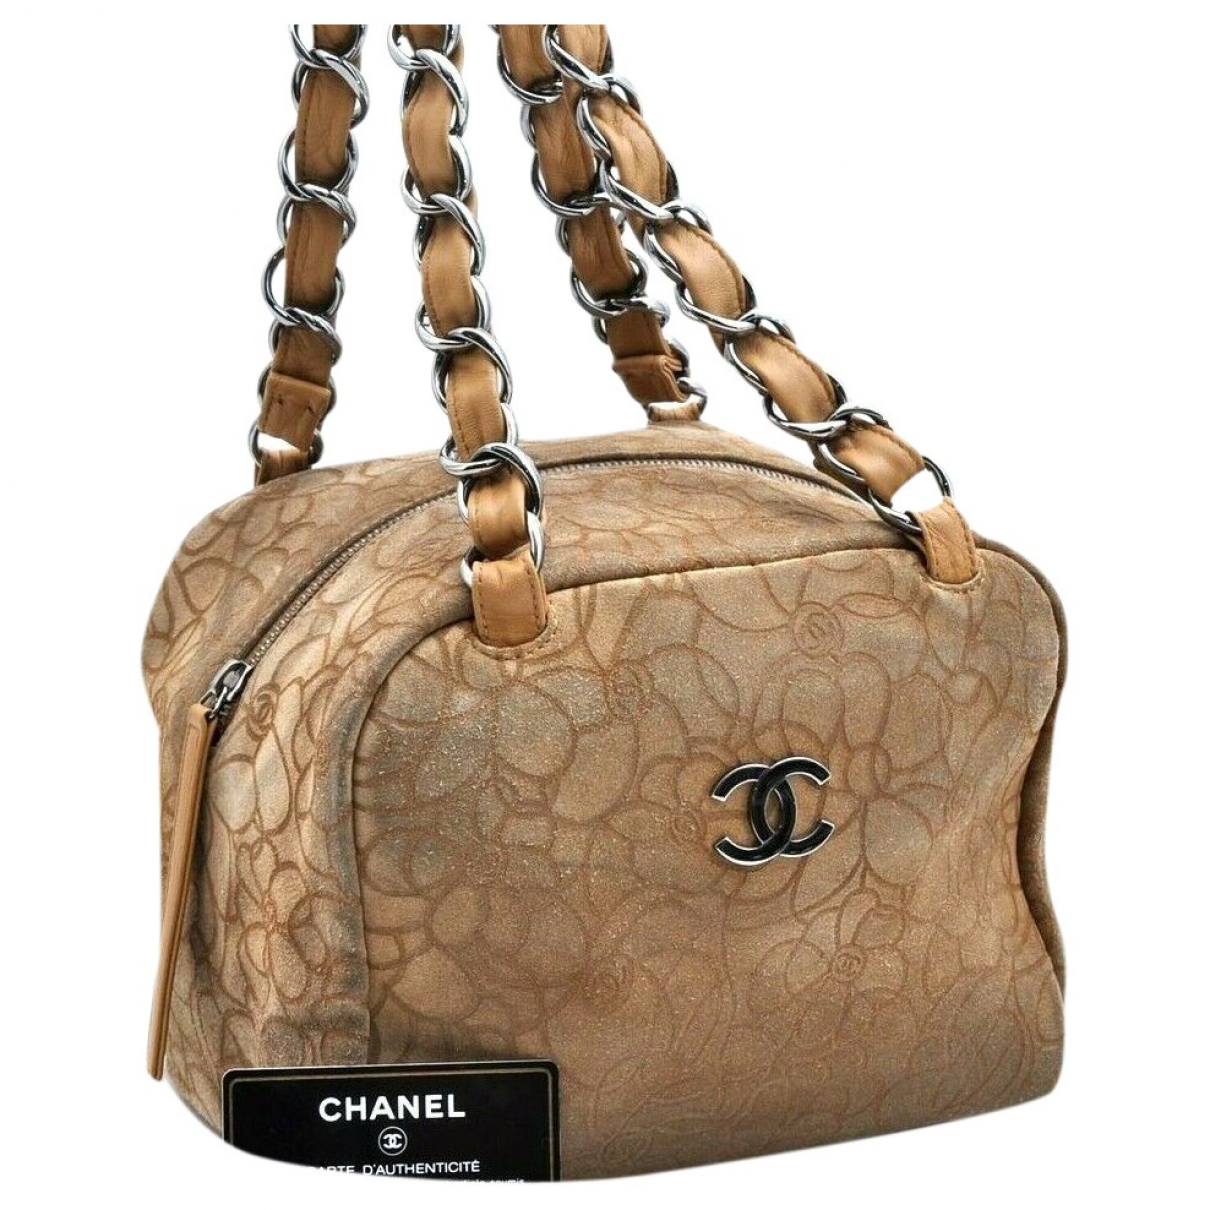 Chanel \N Handtasche in  Beige Veloursleder